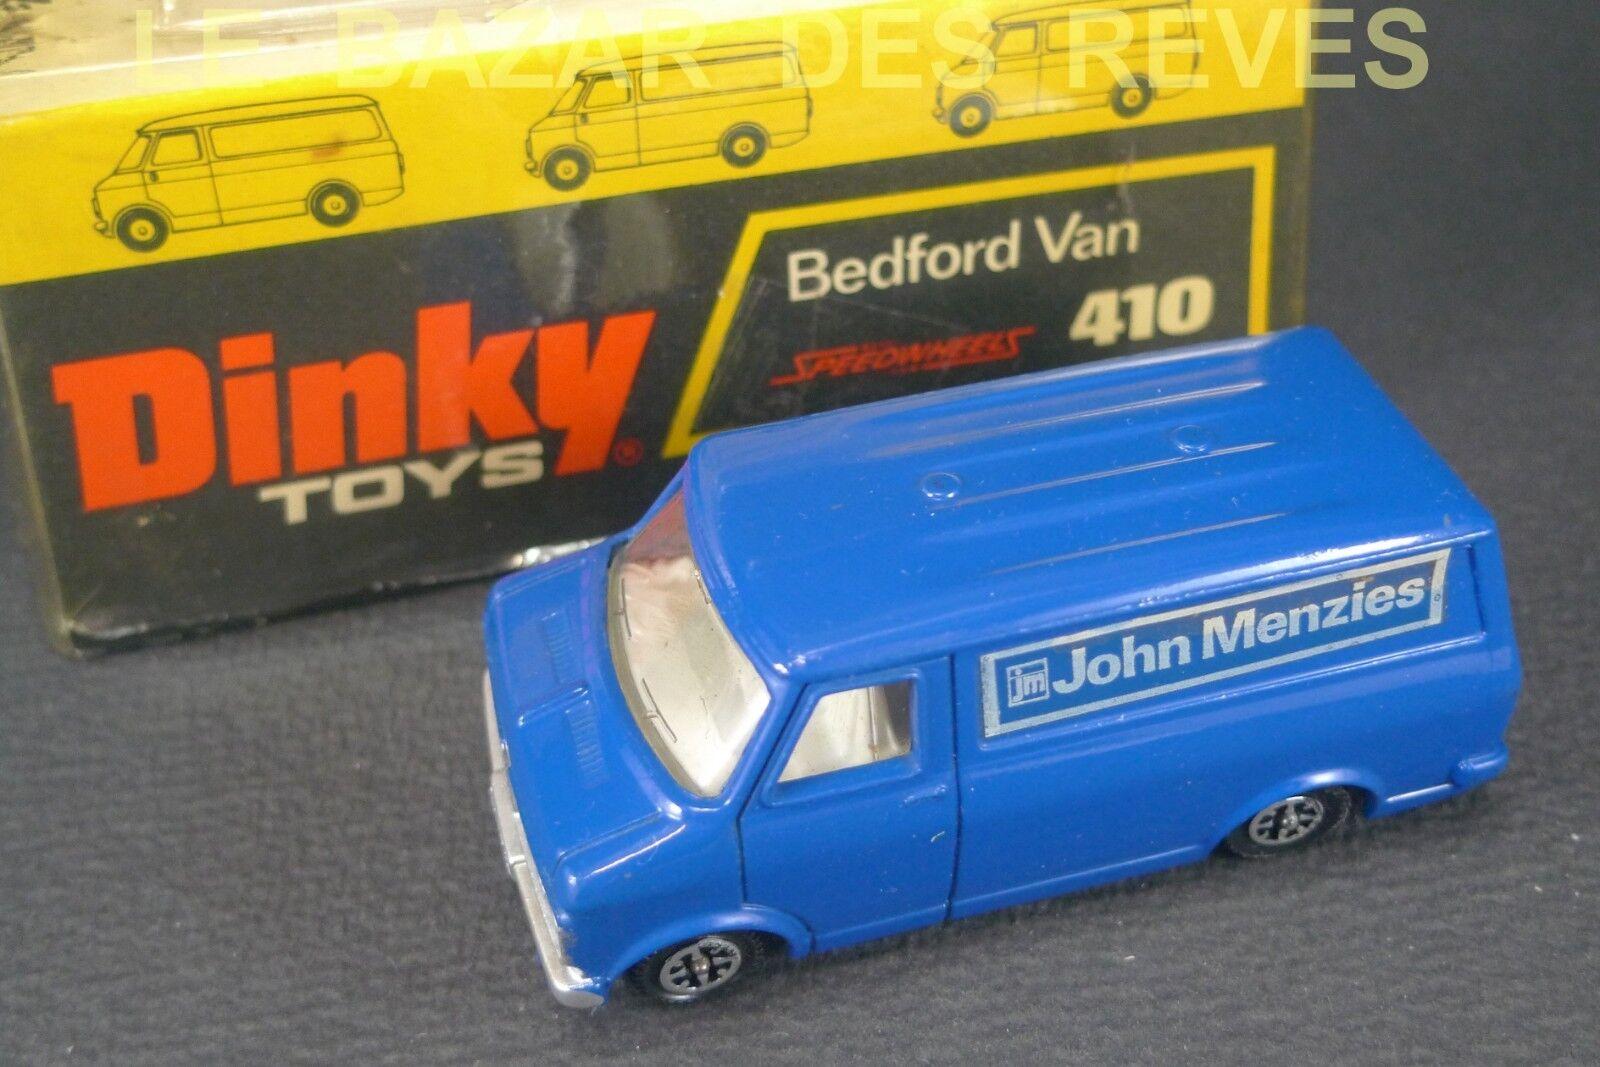 Dinky toys gb. bedford john menzies. ref  410. + box.